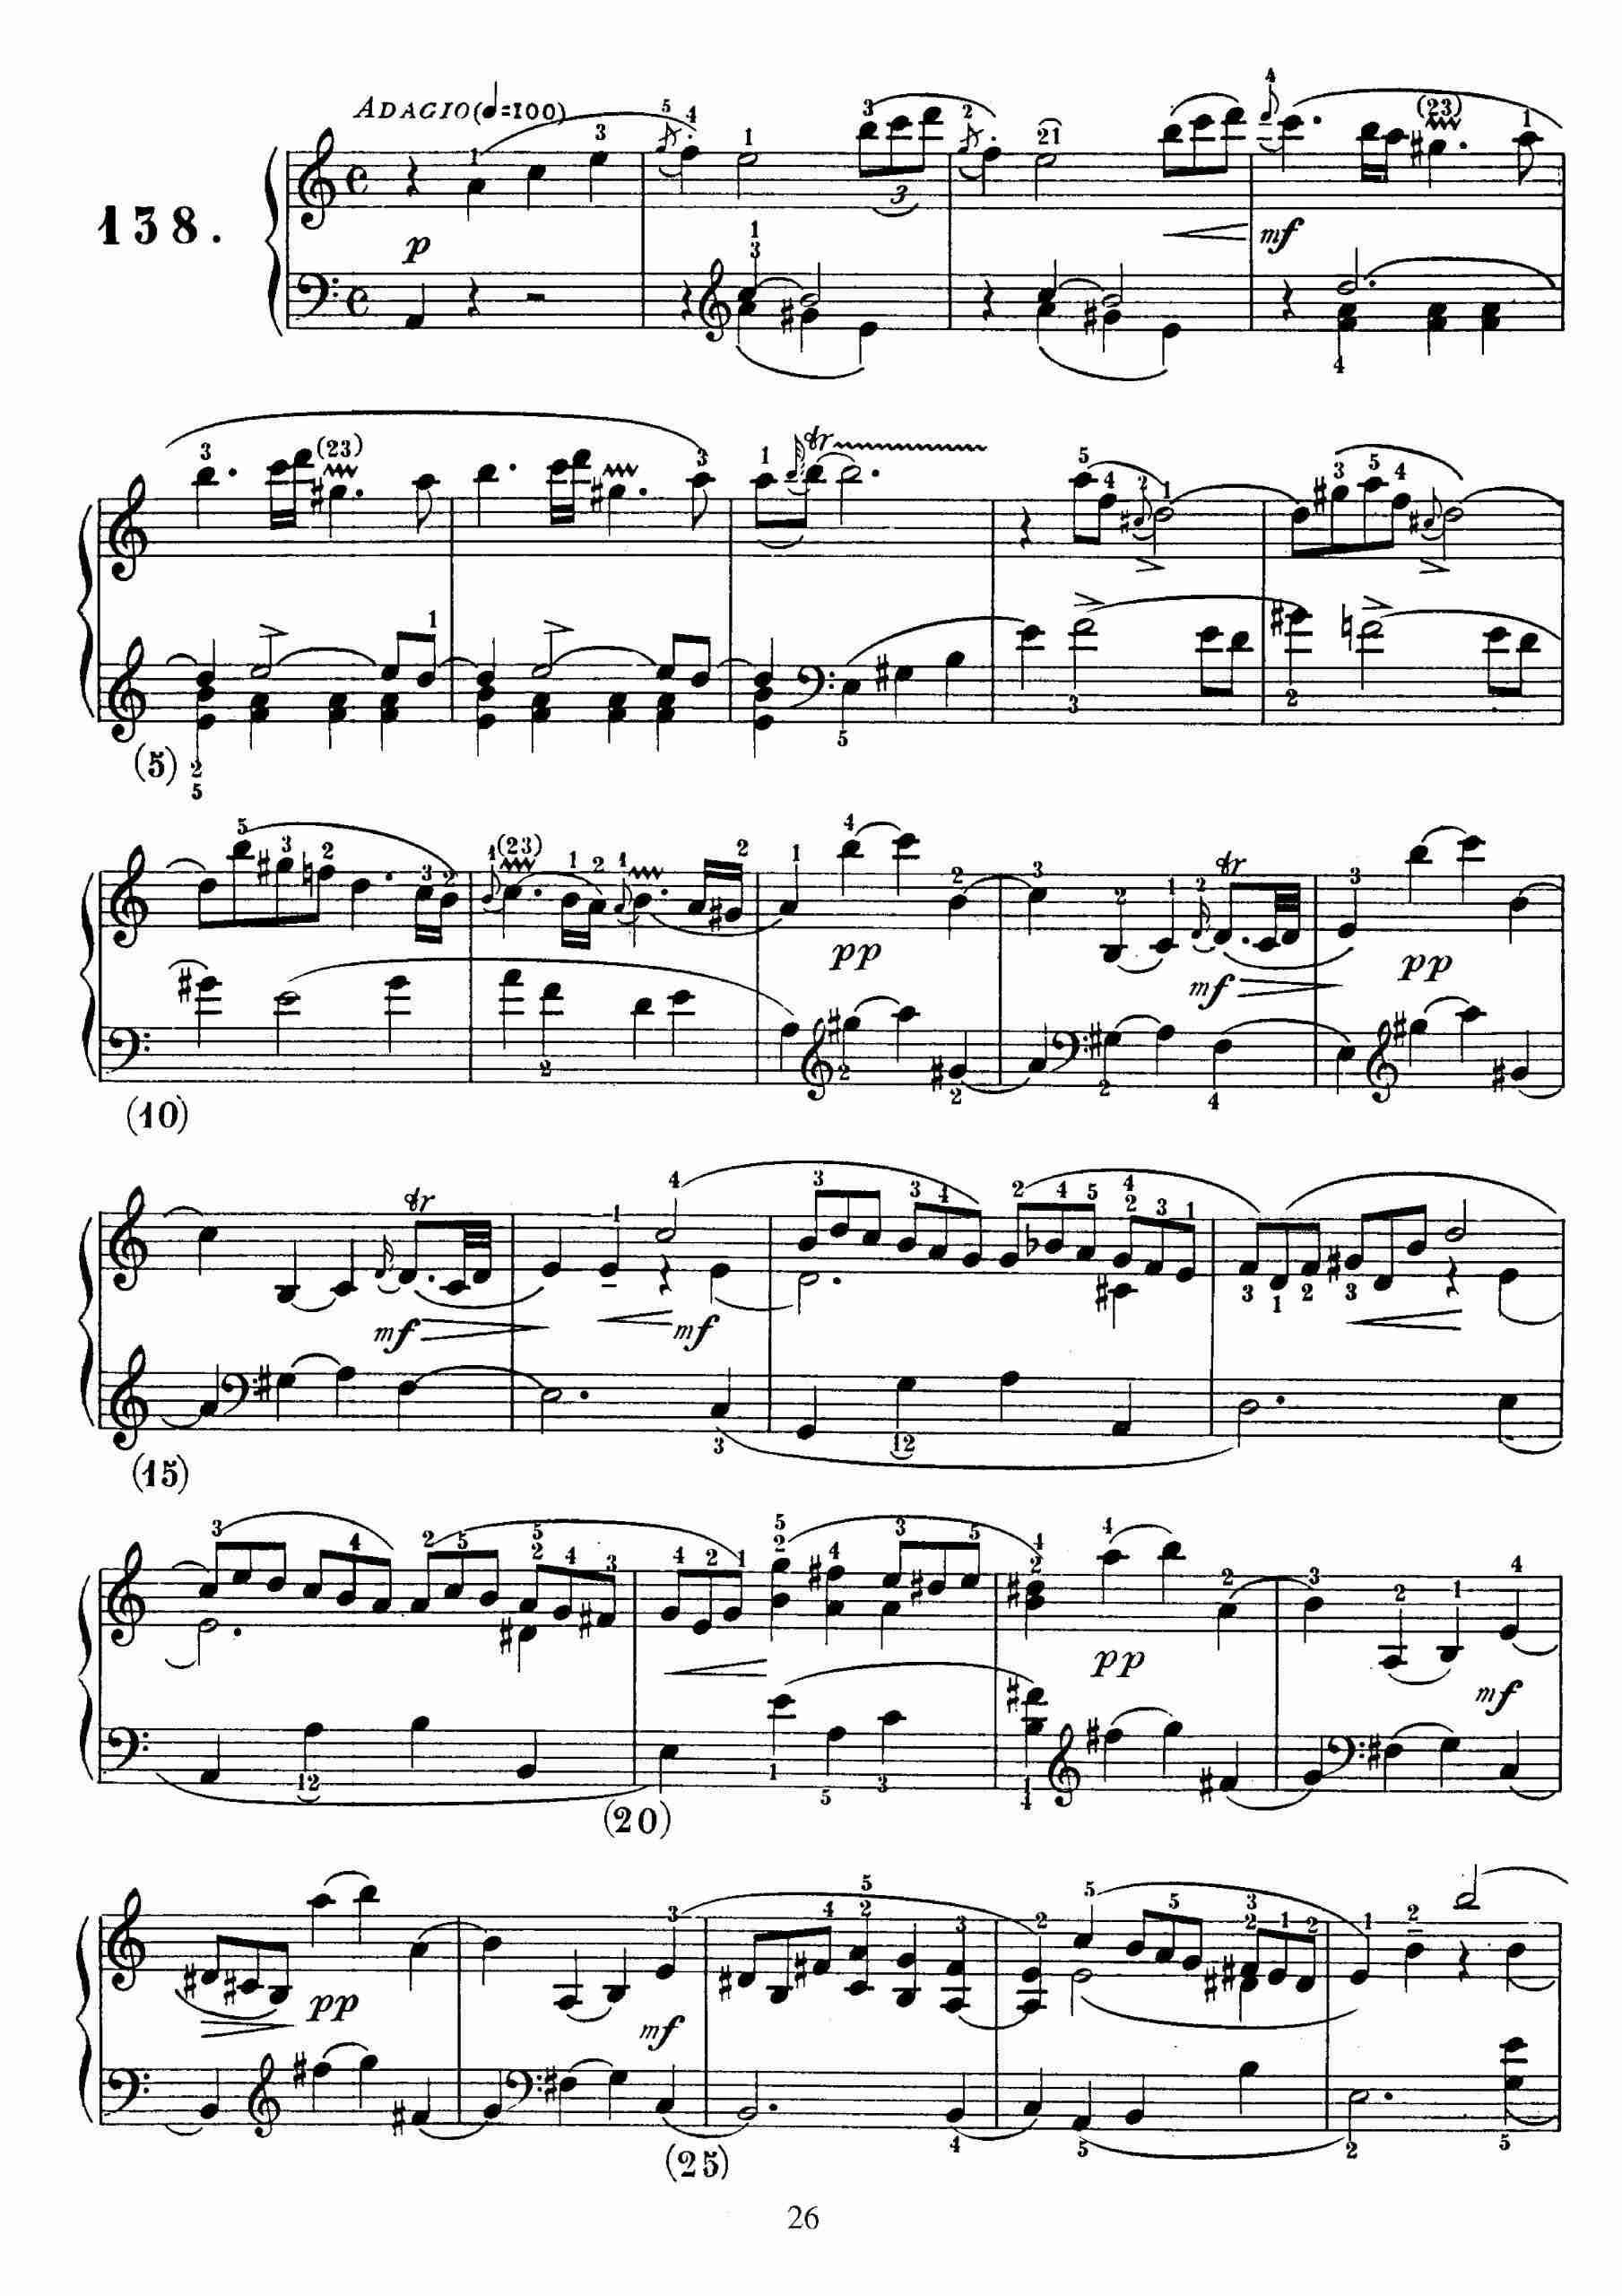 Scarlatti, Domenico - Keyboard Sonata in A minor, K.109